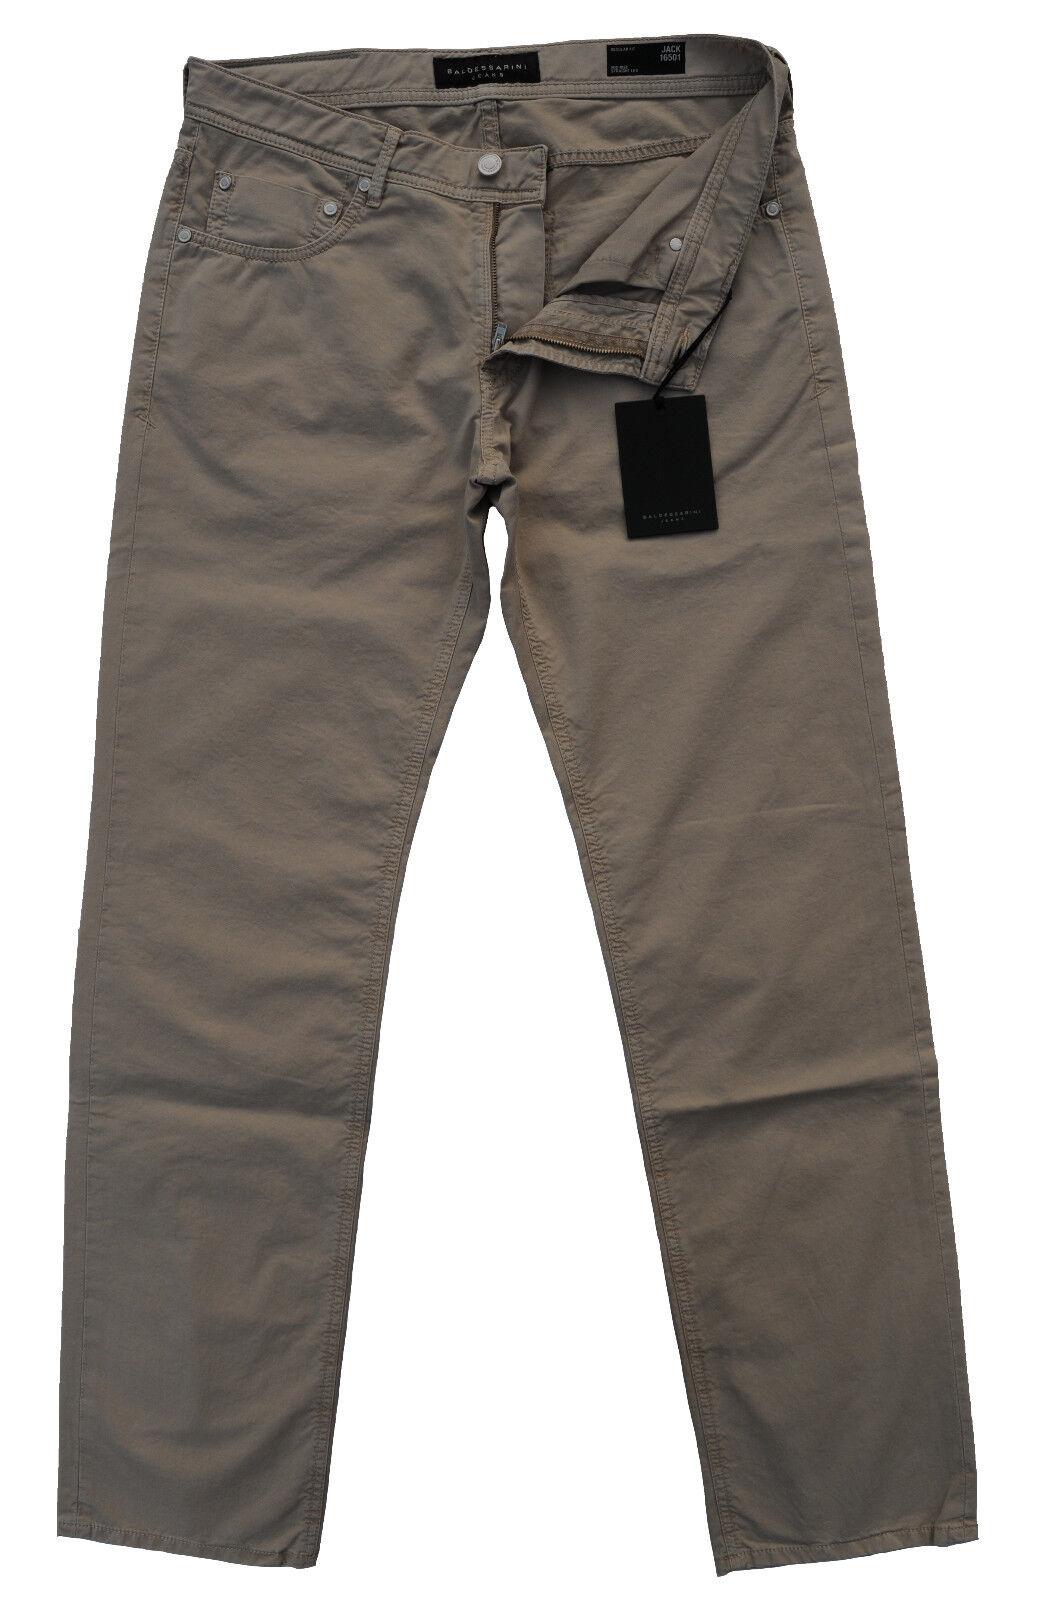 NEUF 99 34/34 Baldessarini jeans beige clair pantalon REGULAR FIT 99 NEUF e4c2dc